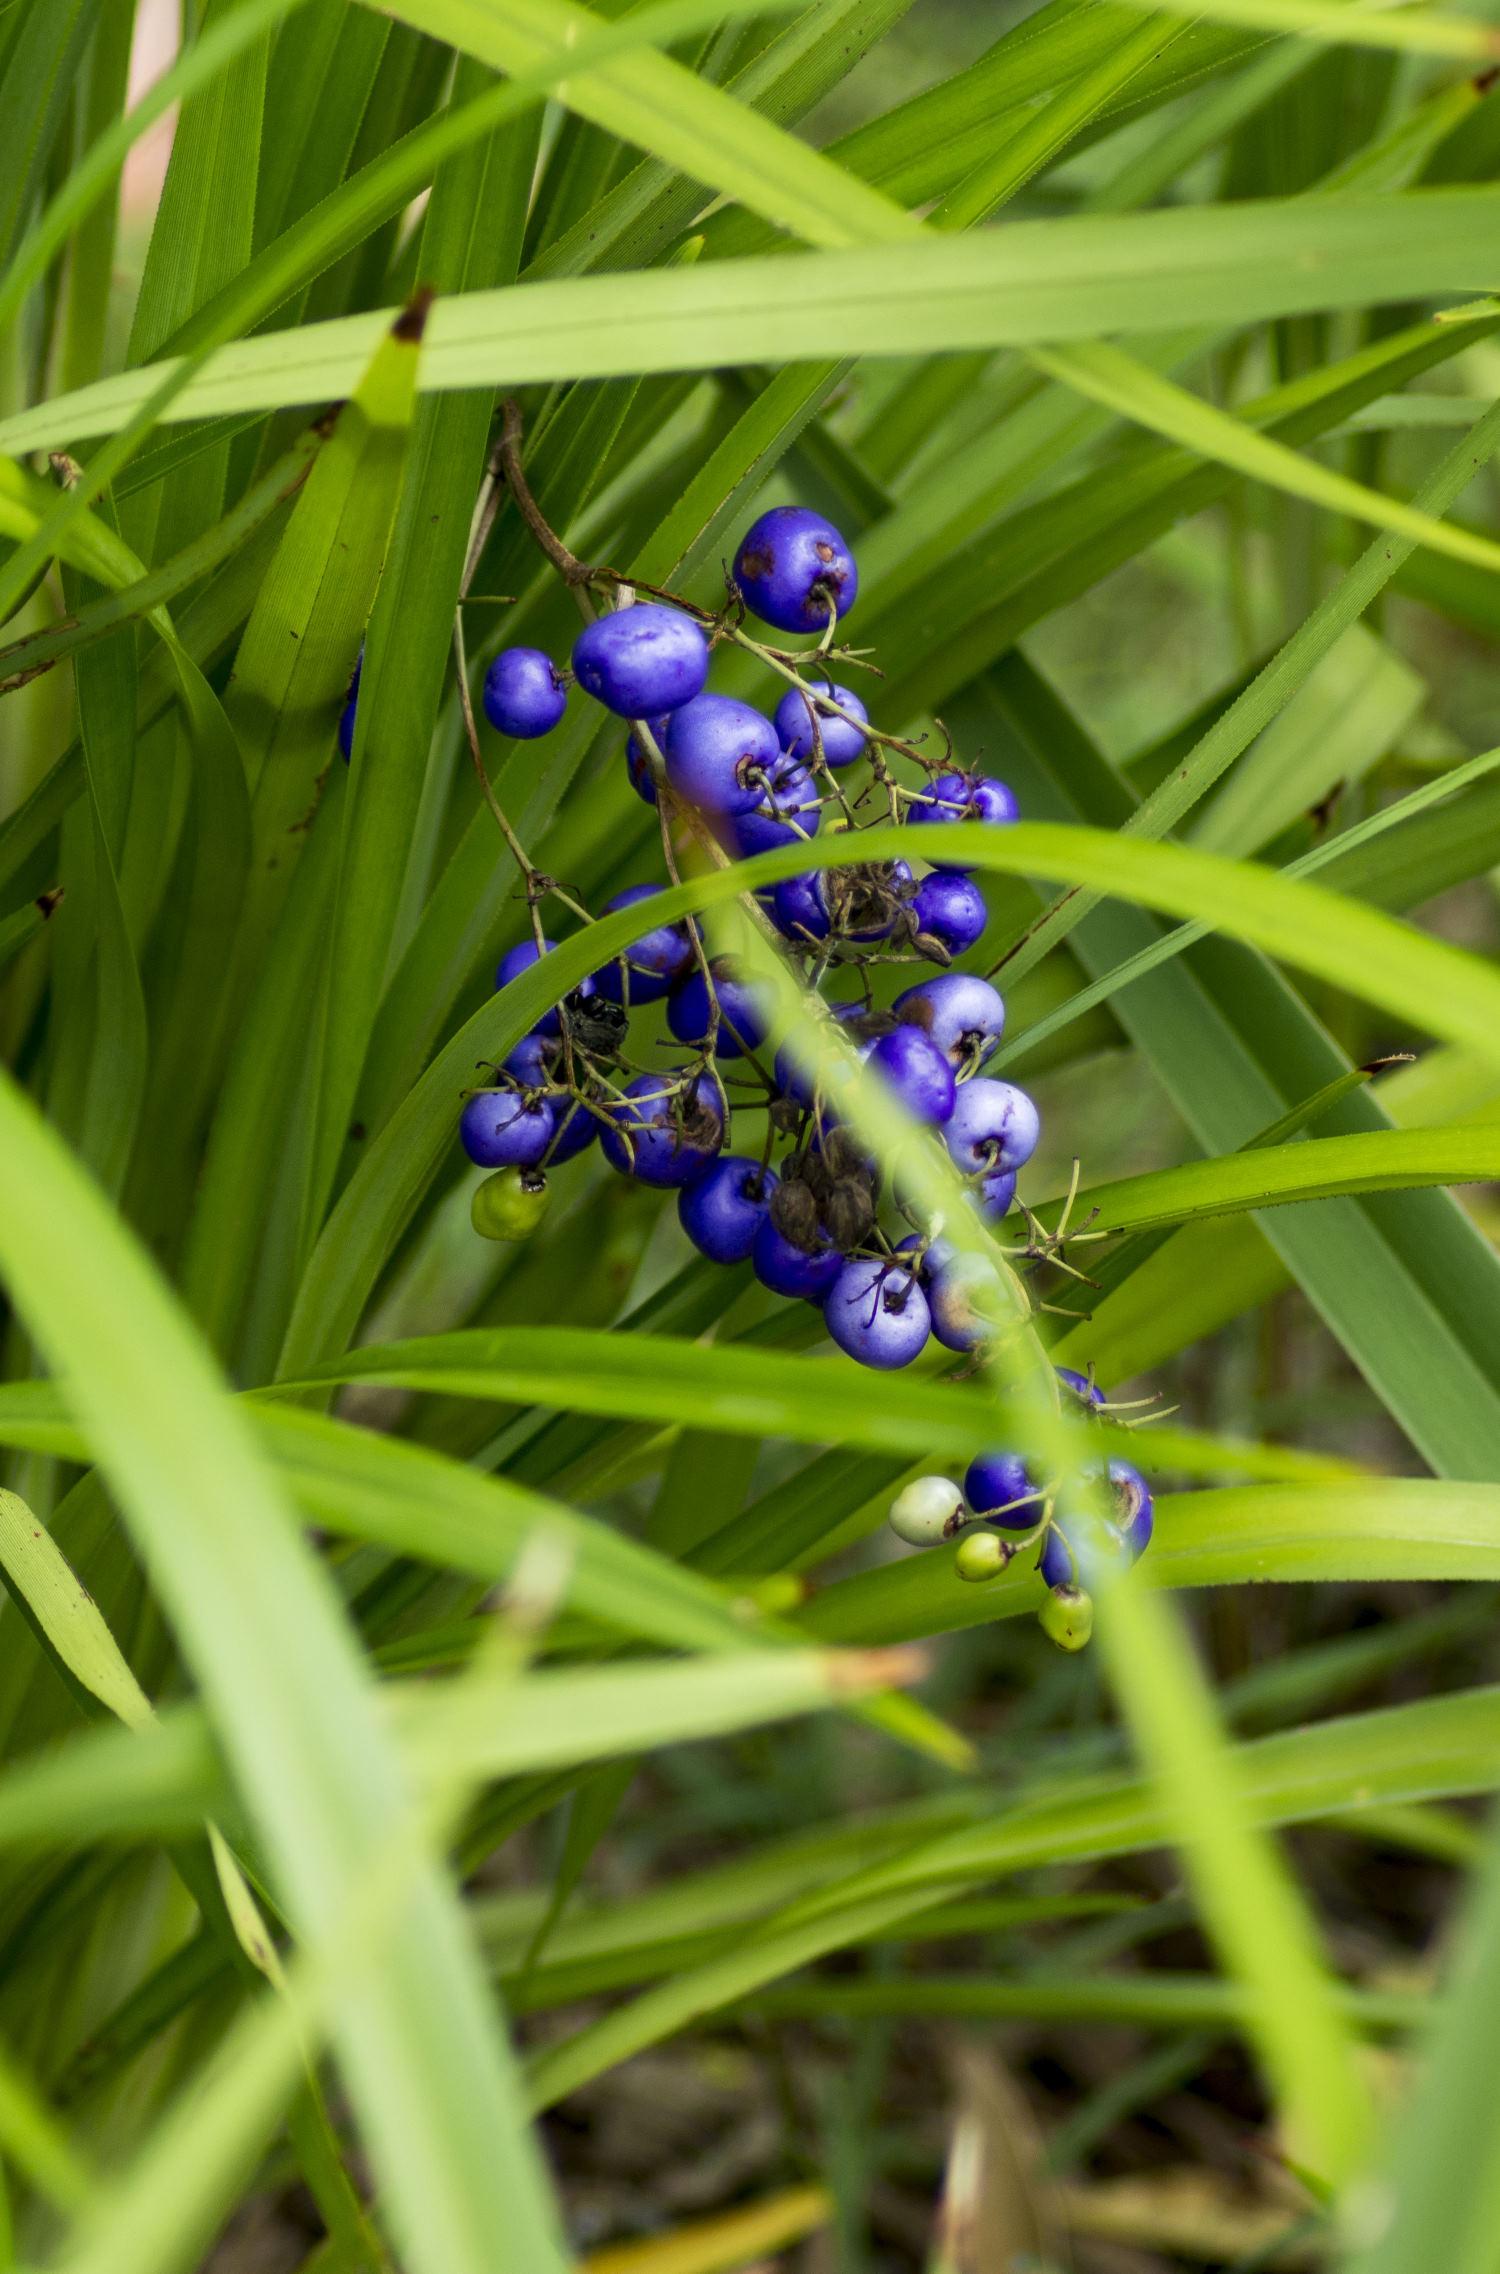 Dianella caerulea - Berries